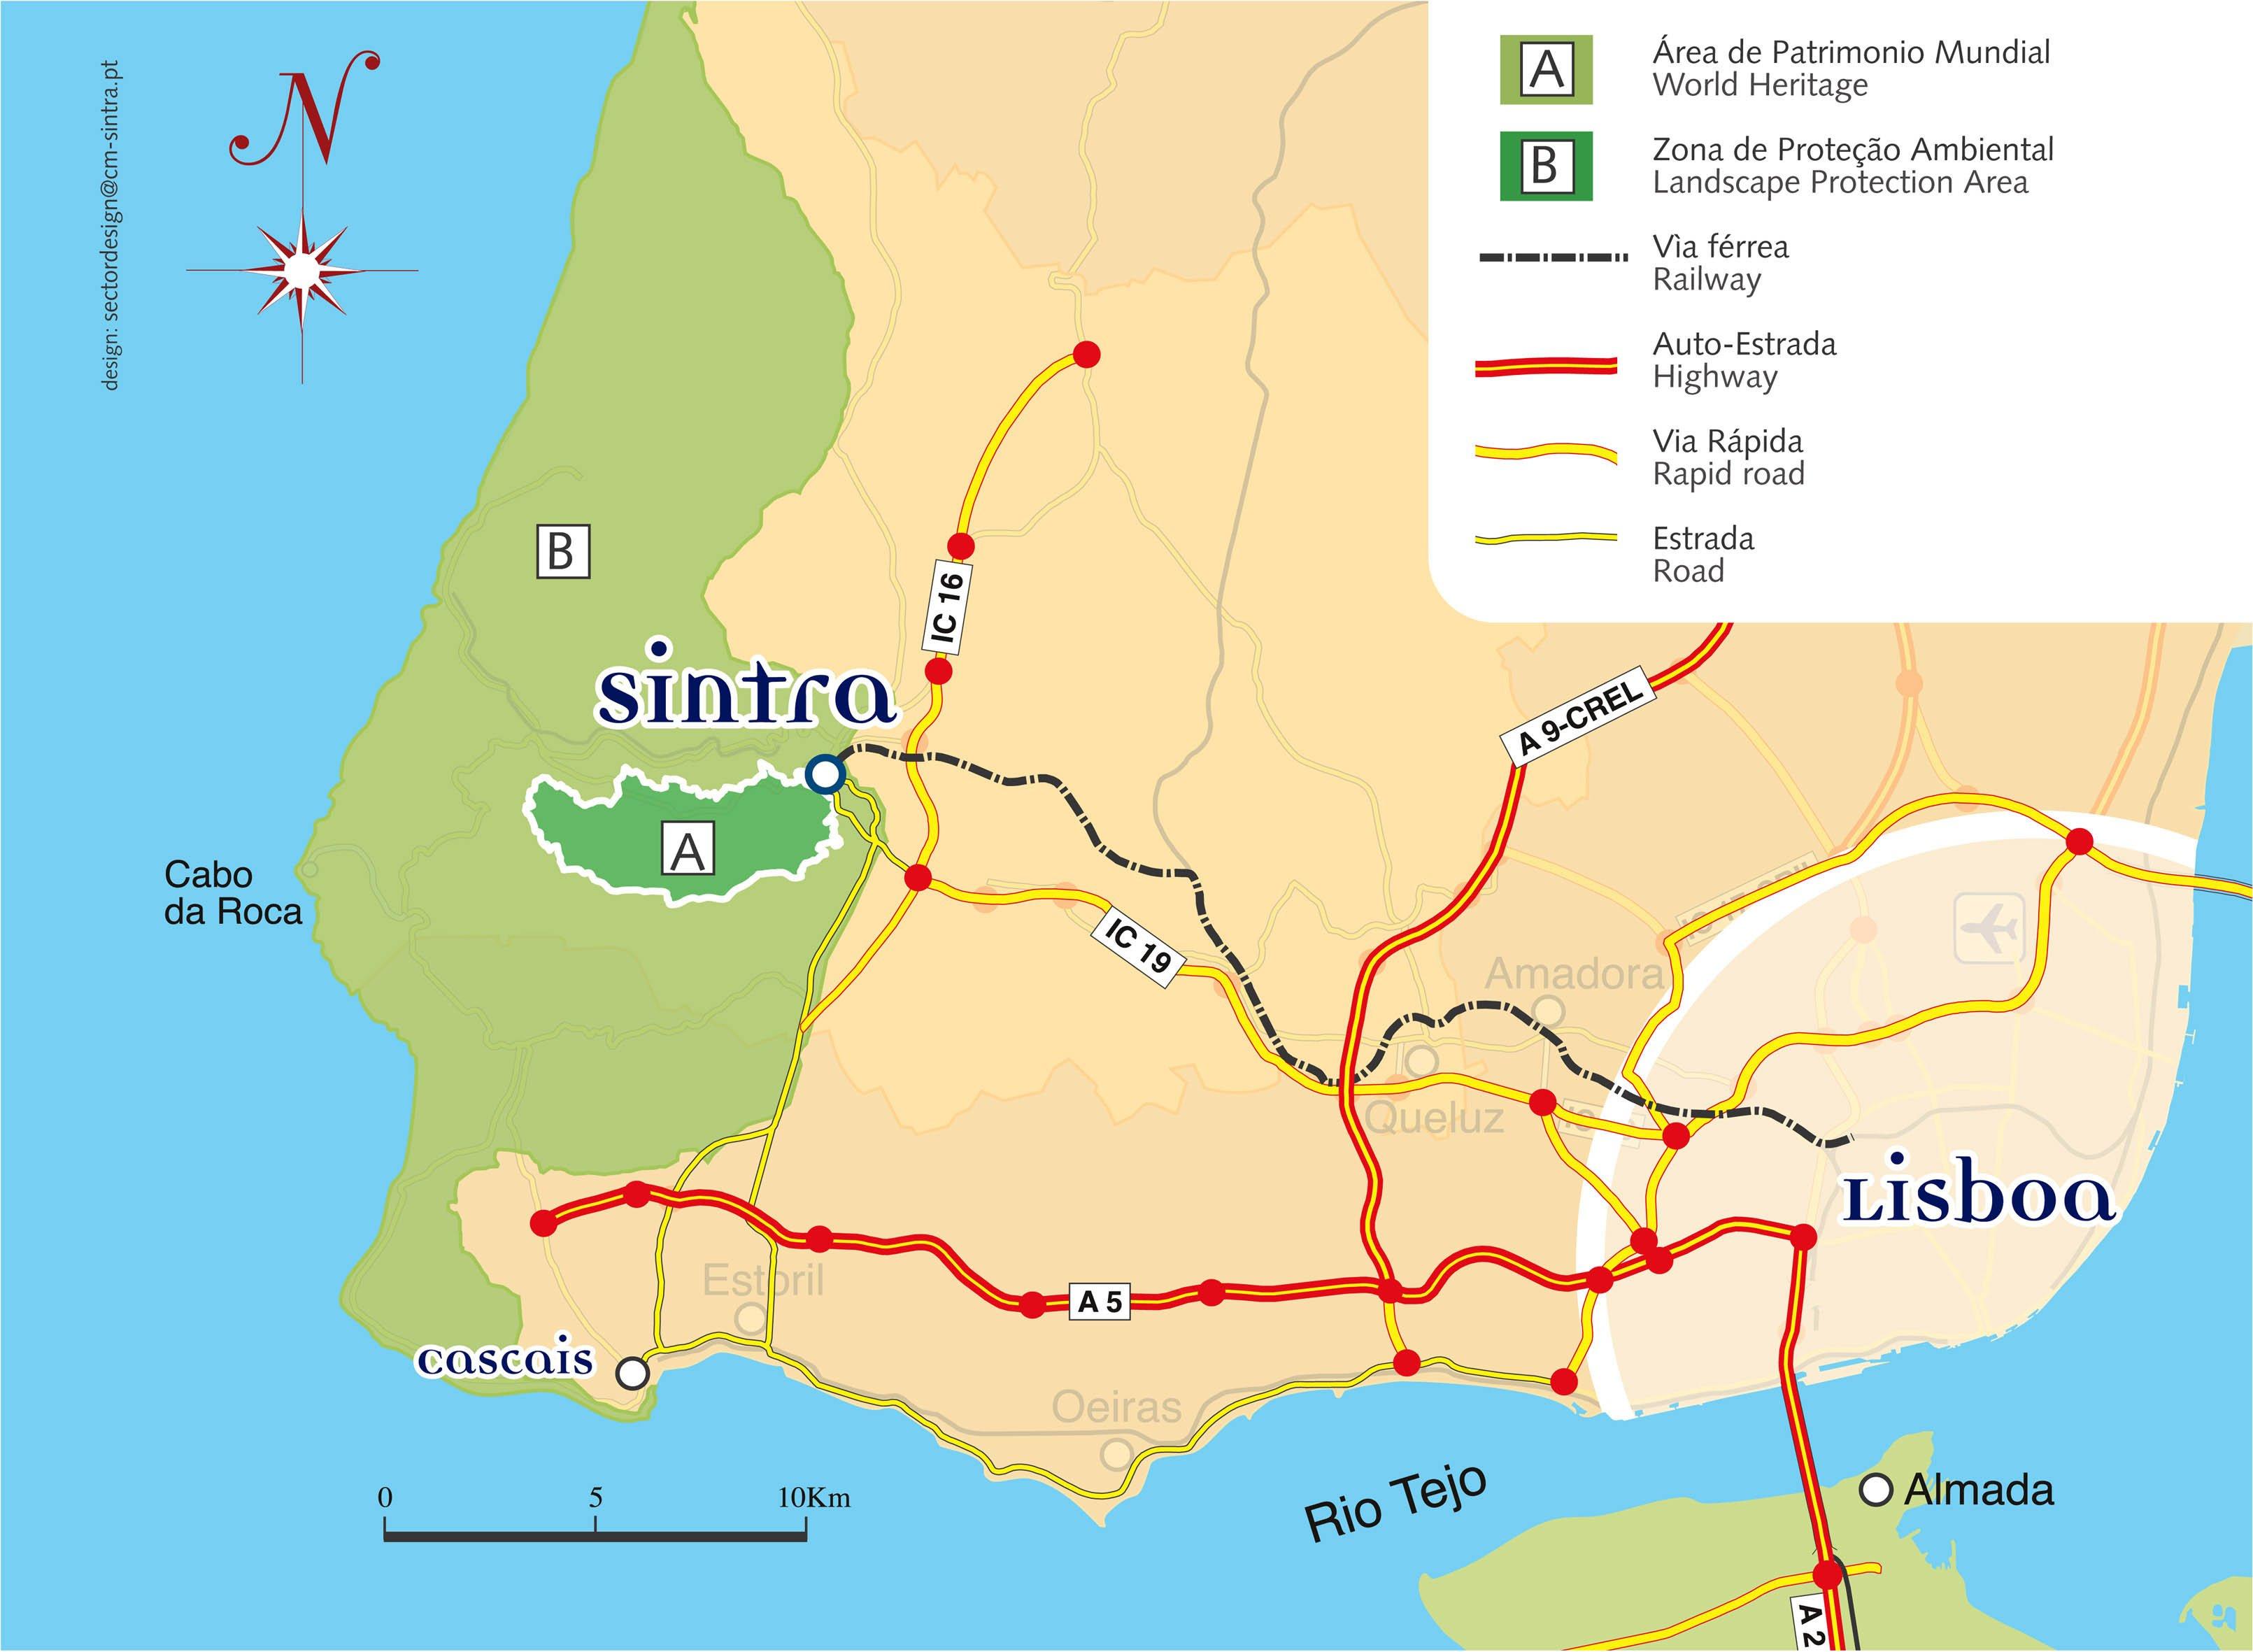 mapa de lisboa sintra Património Mundial   PATRIMONIO   Câmara Municipal de Sintra mapa de lisboa sintra